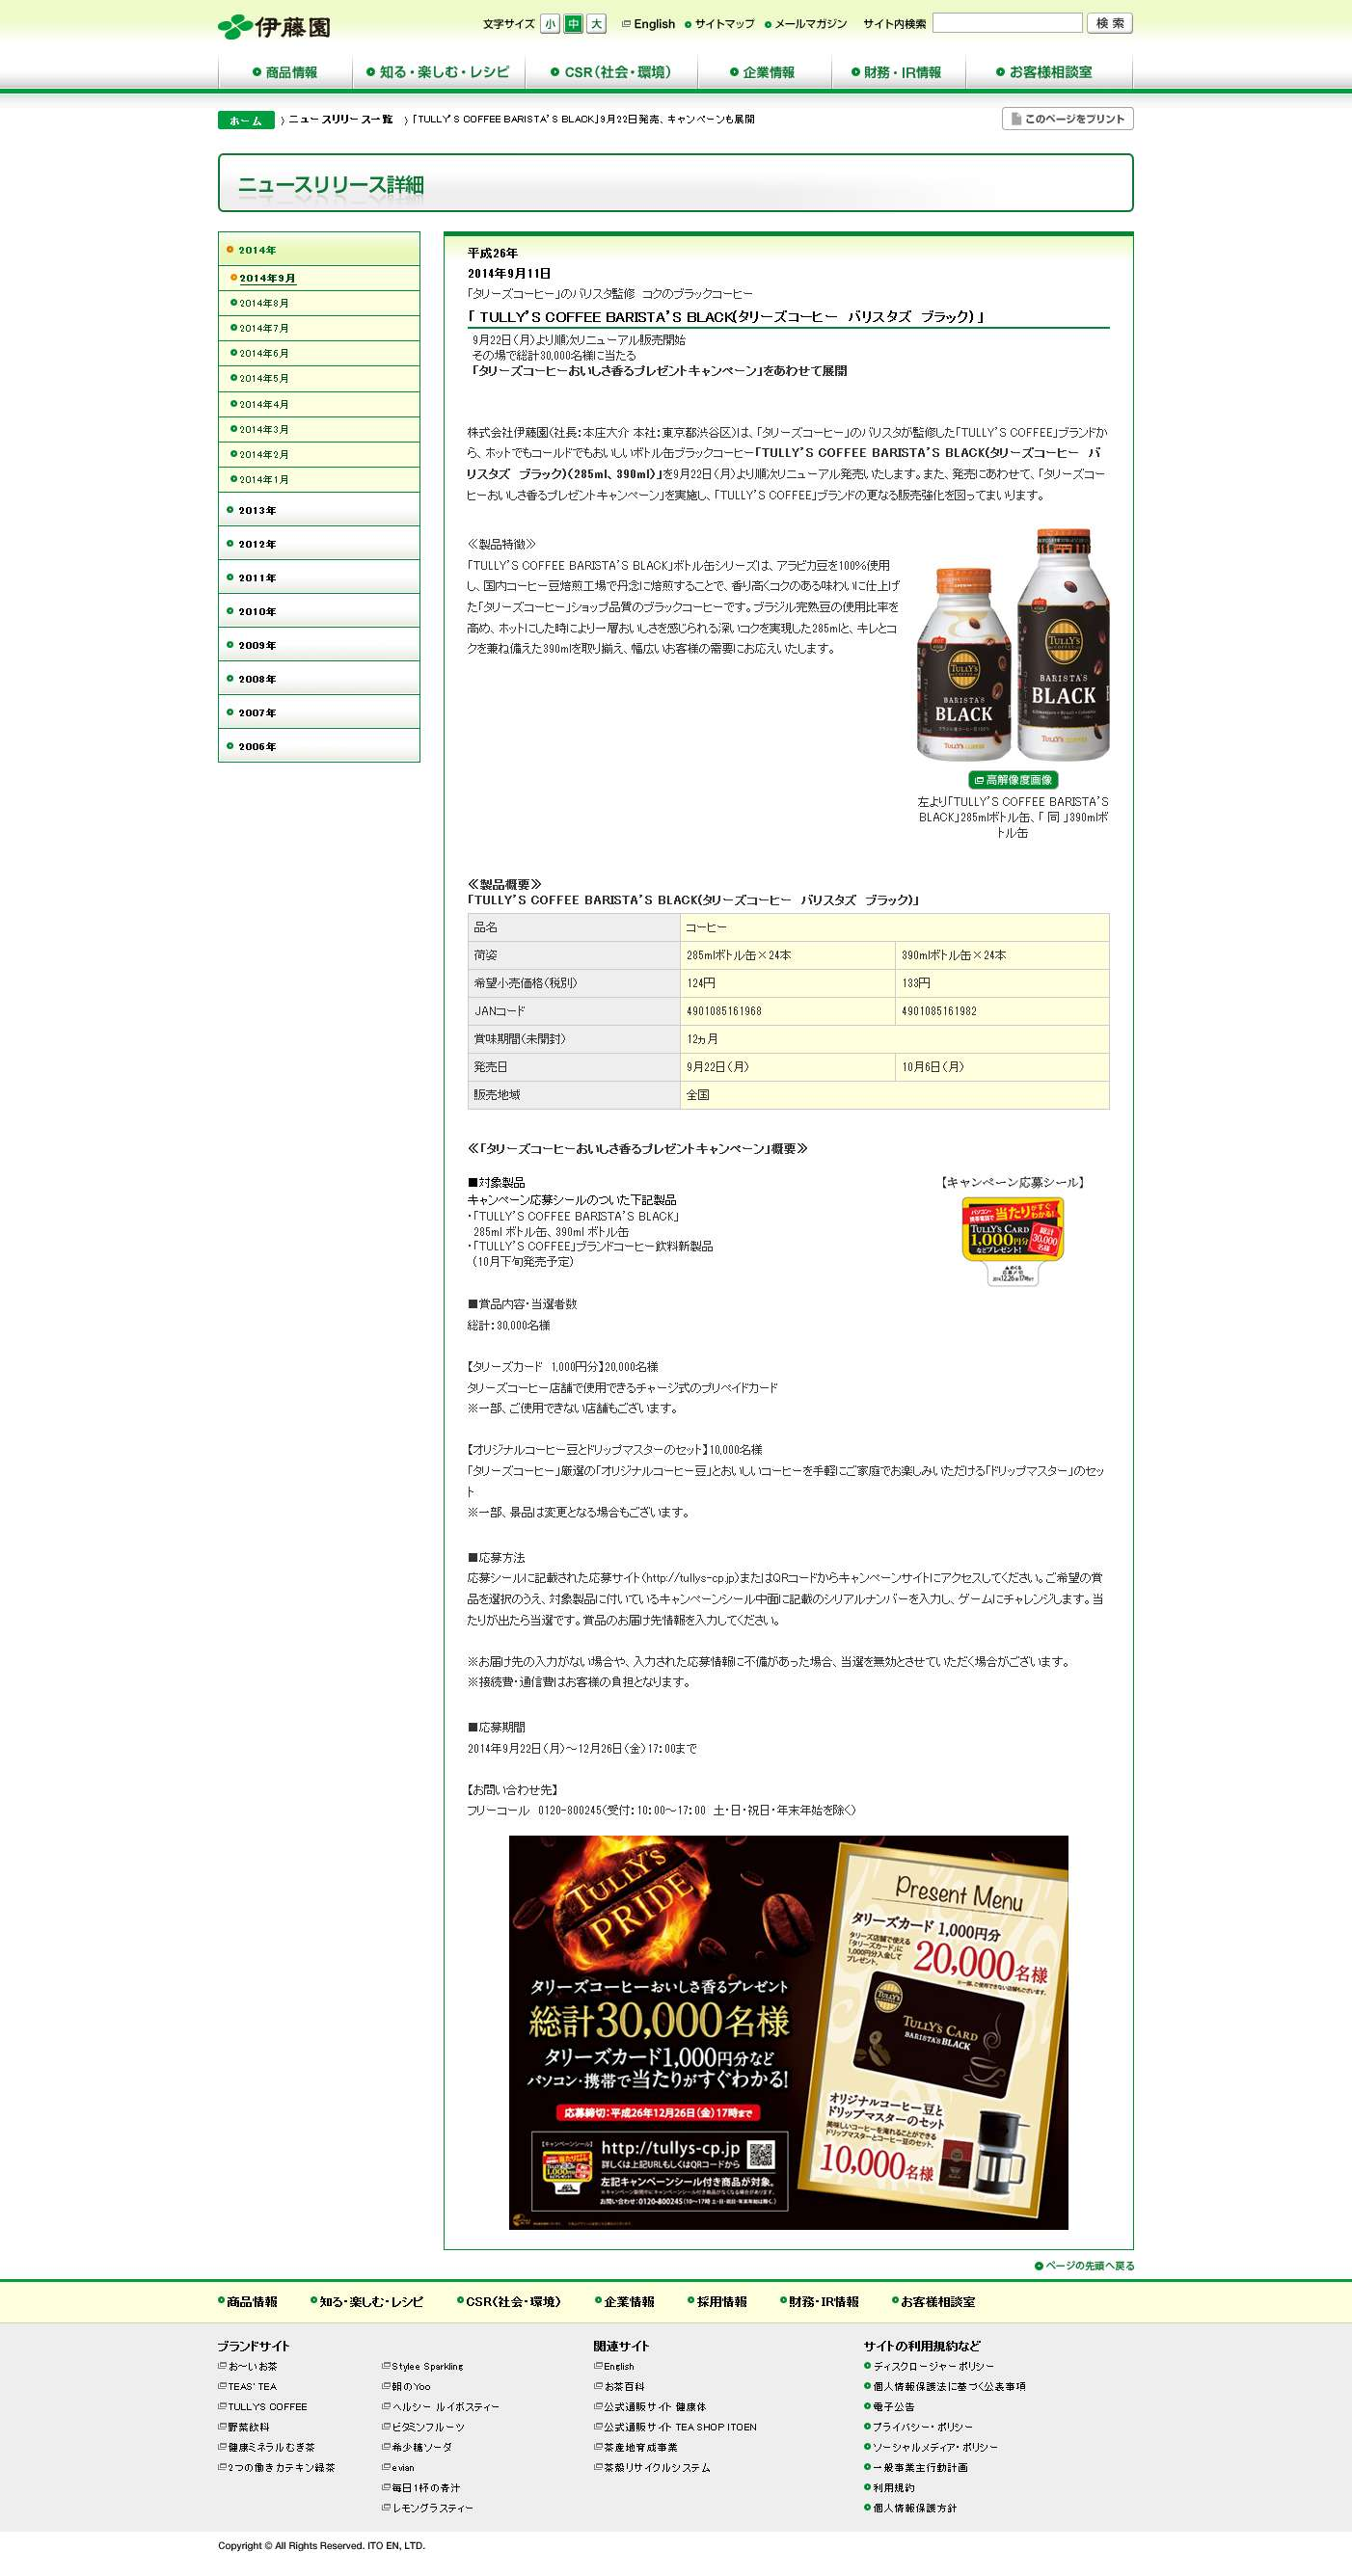 「TULLY'S COFFEE BARISTA'S BLACK」9月22日発売、キャンペーンも展開  ニュースリリース一覧  伊藤園